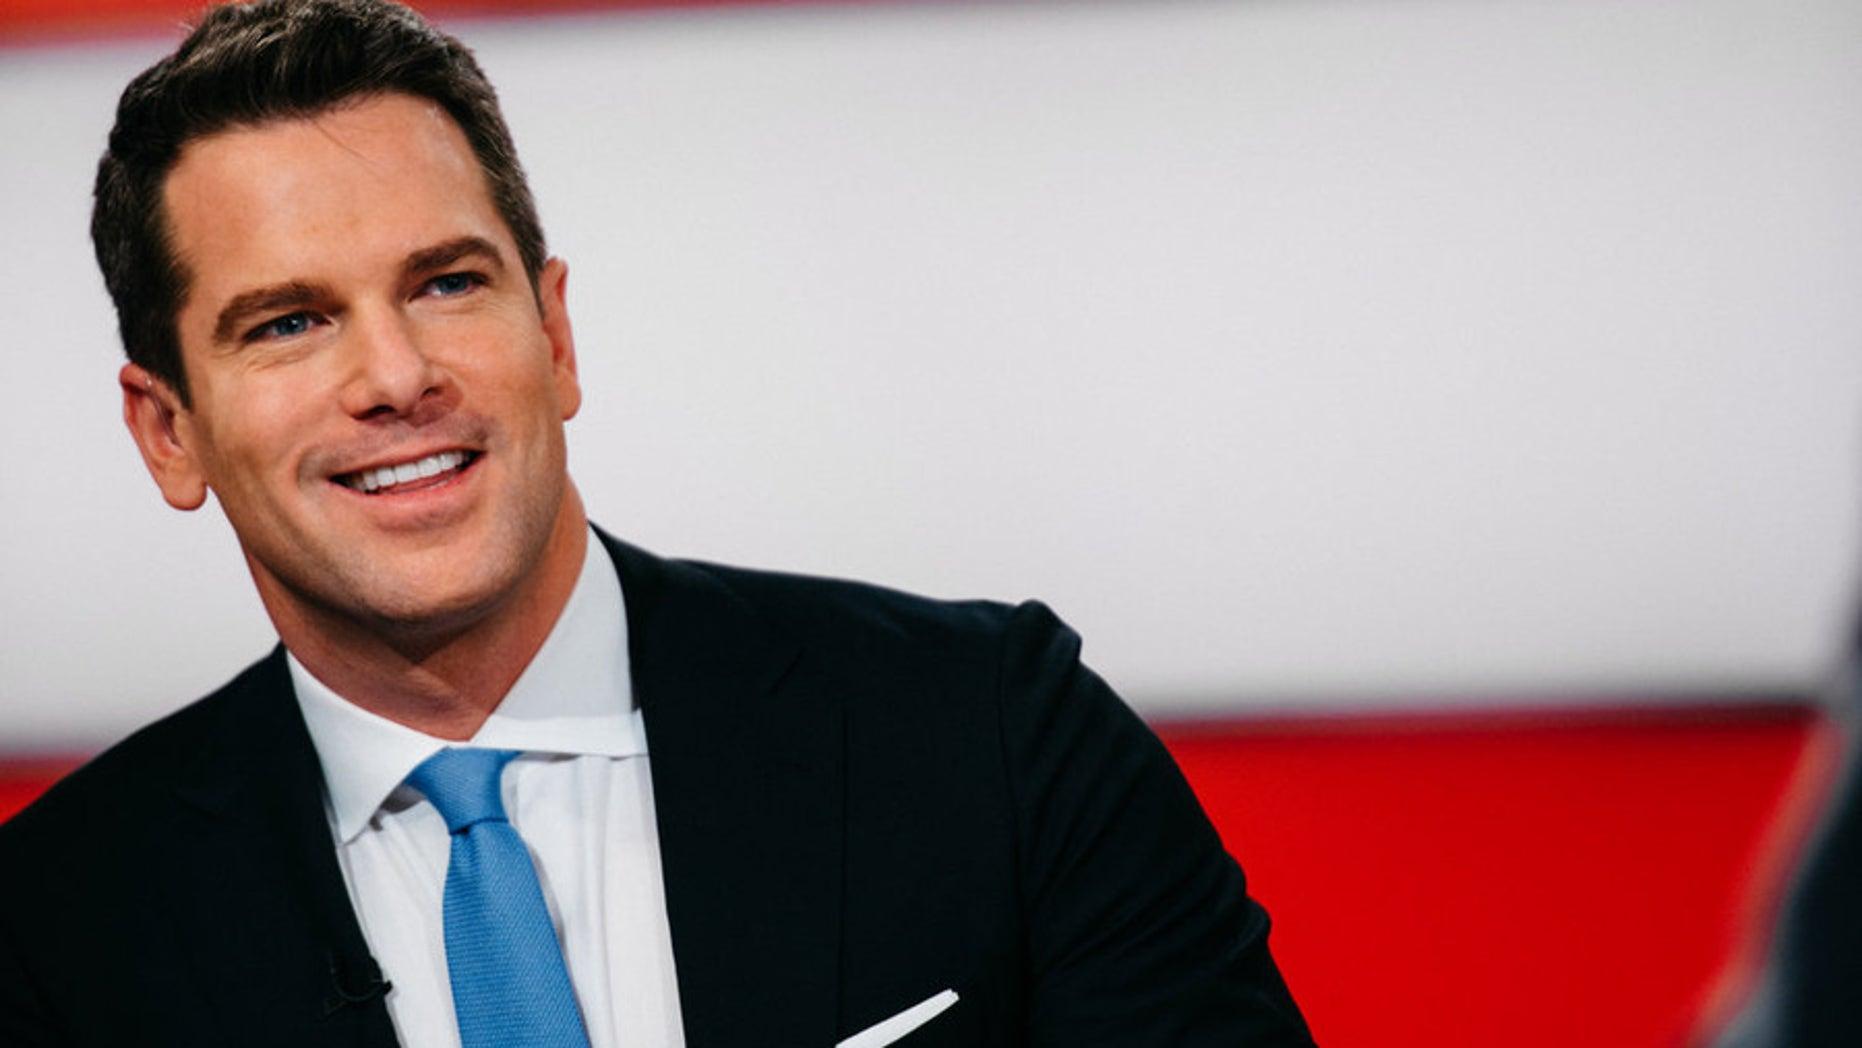 MSNBC has cancelled Thomas Roberts' show.